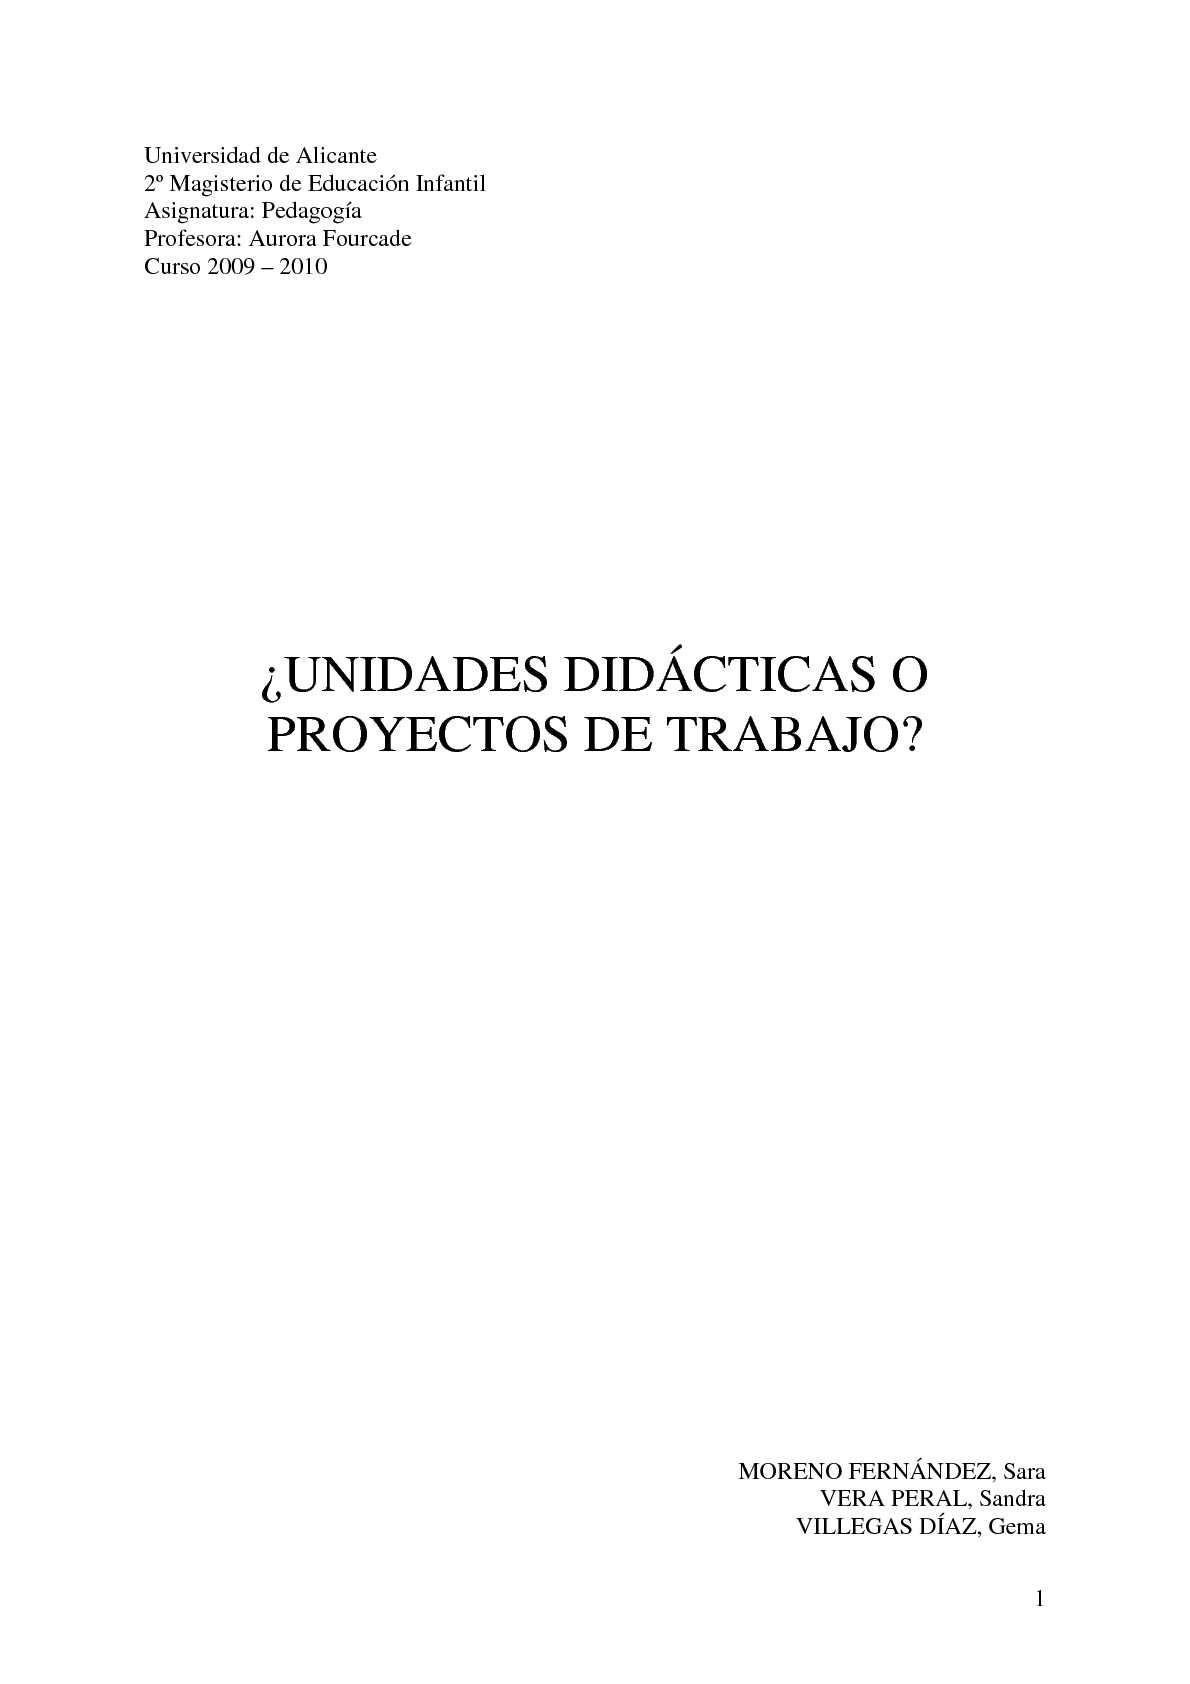 Calaméo - ¿Unidades didácticas o Proyectos de trabajo?